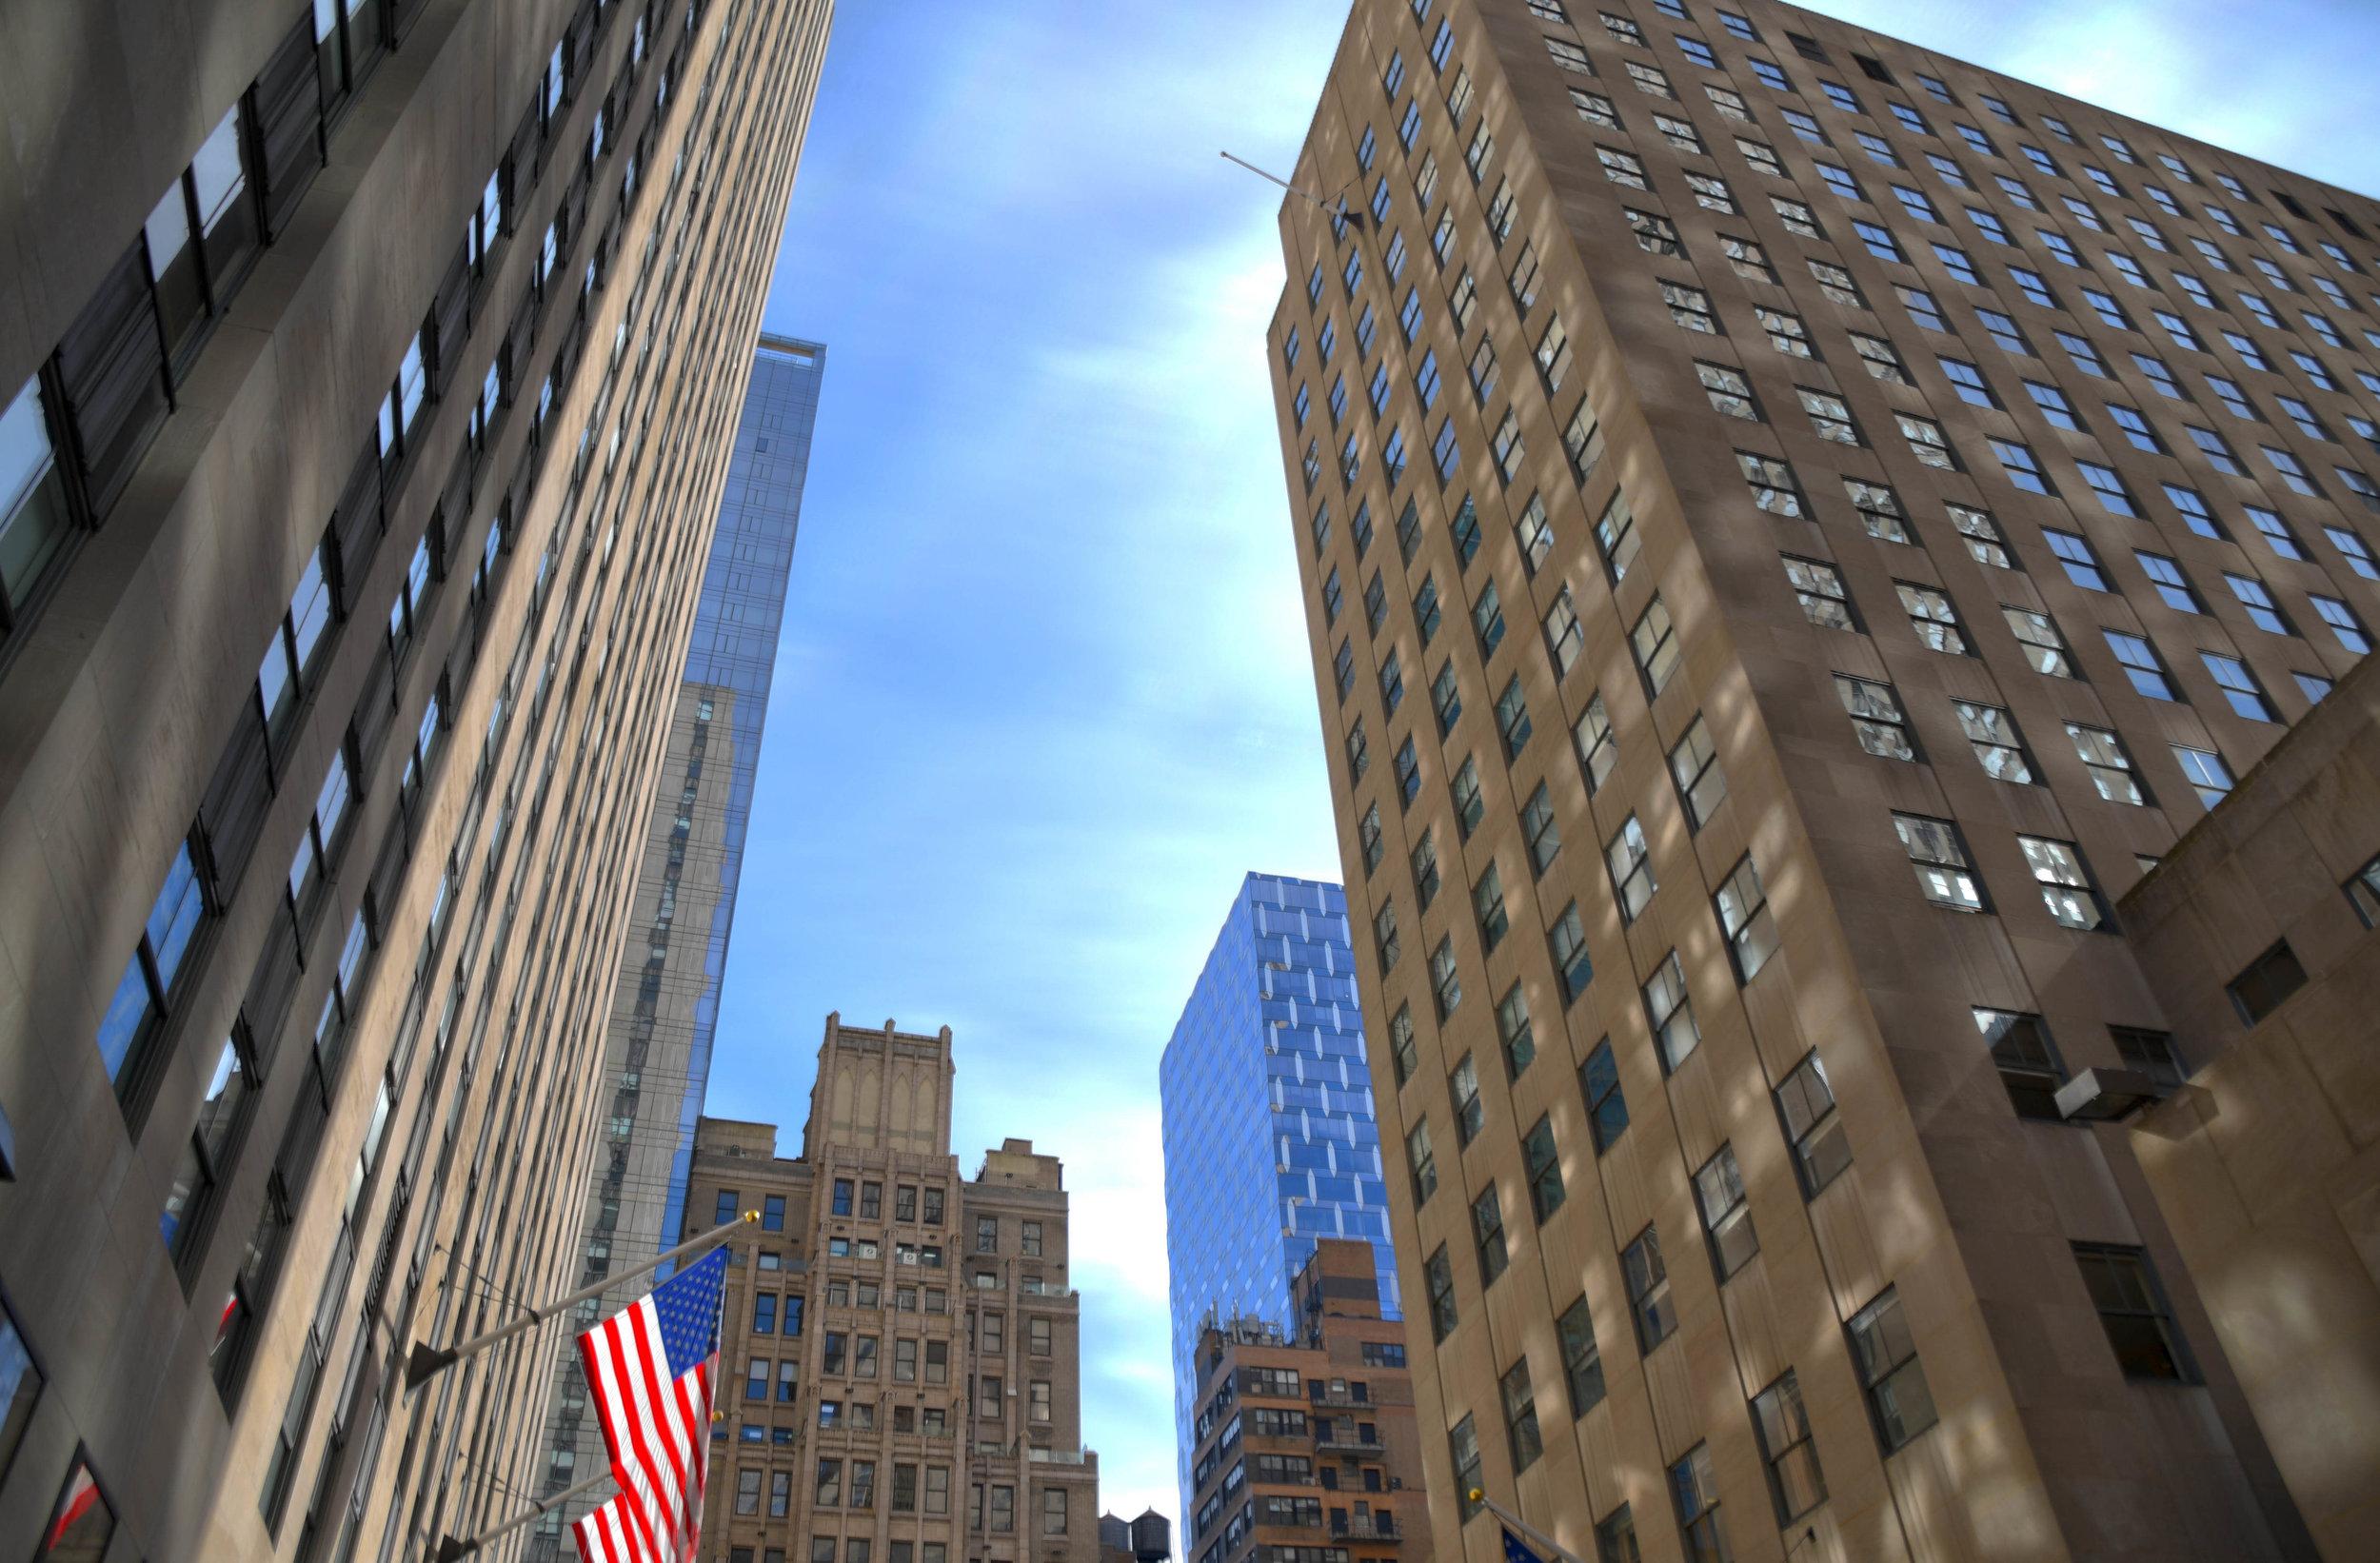 HDR'd New York